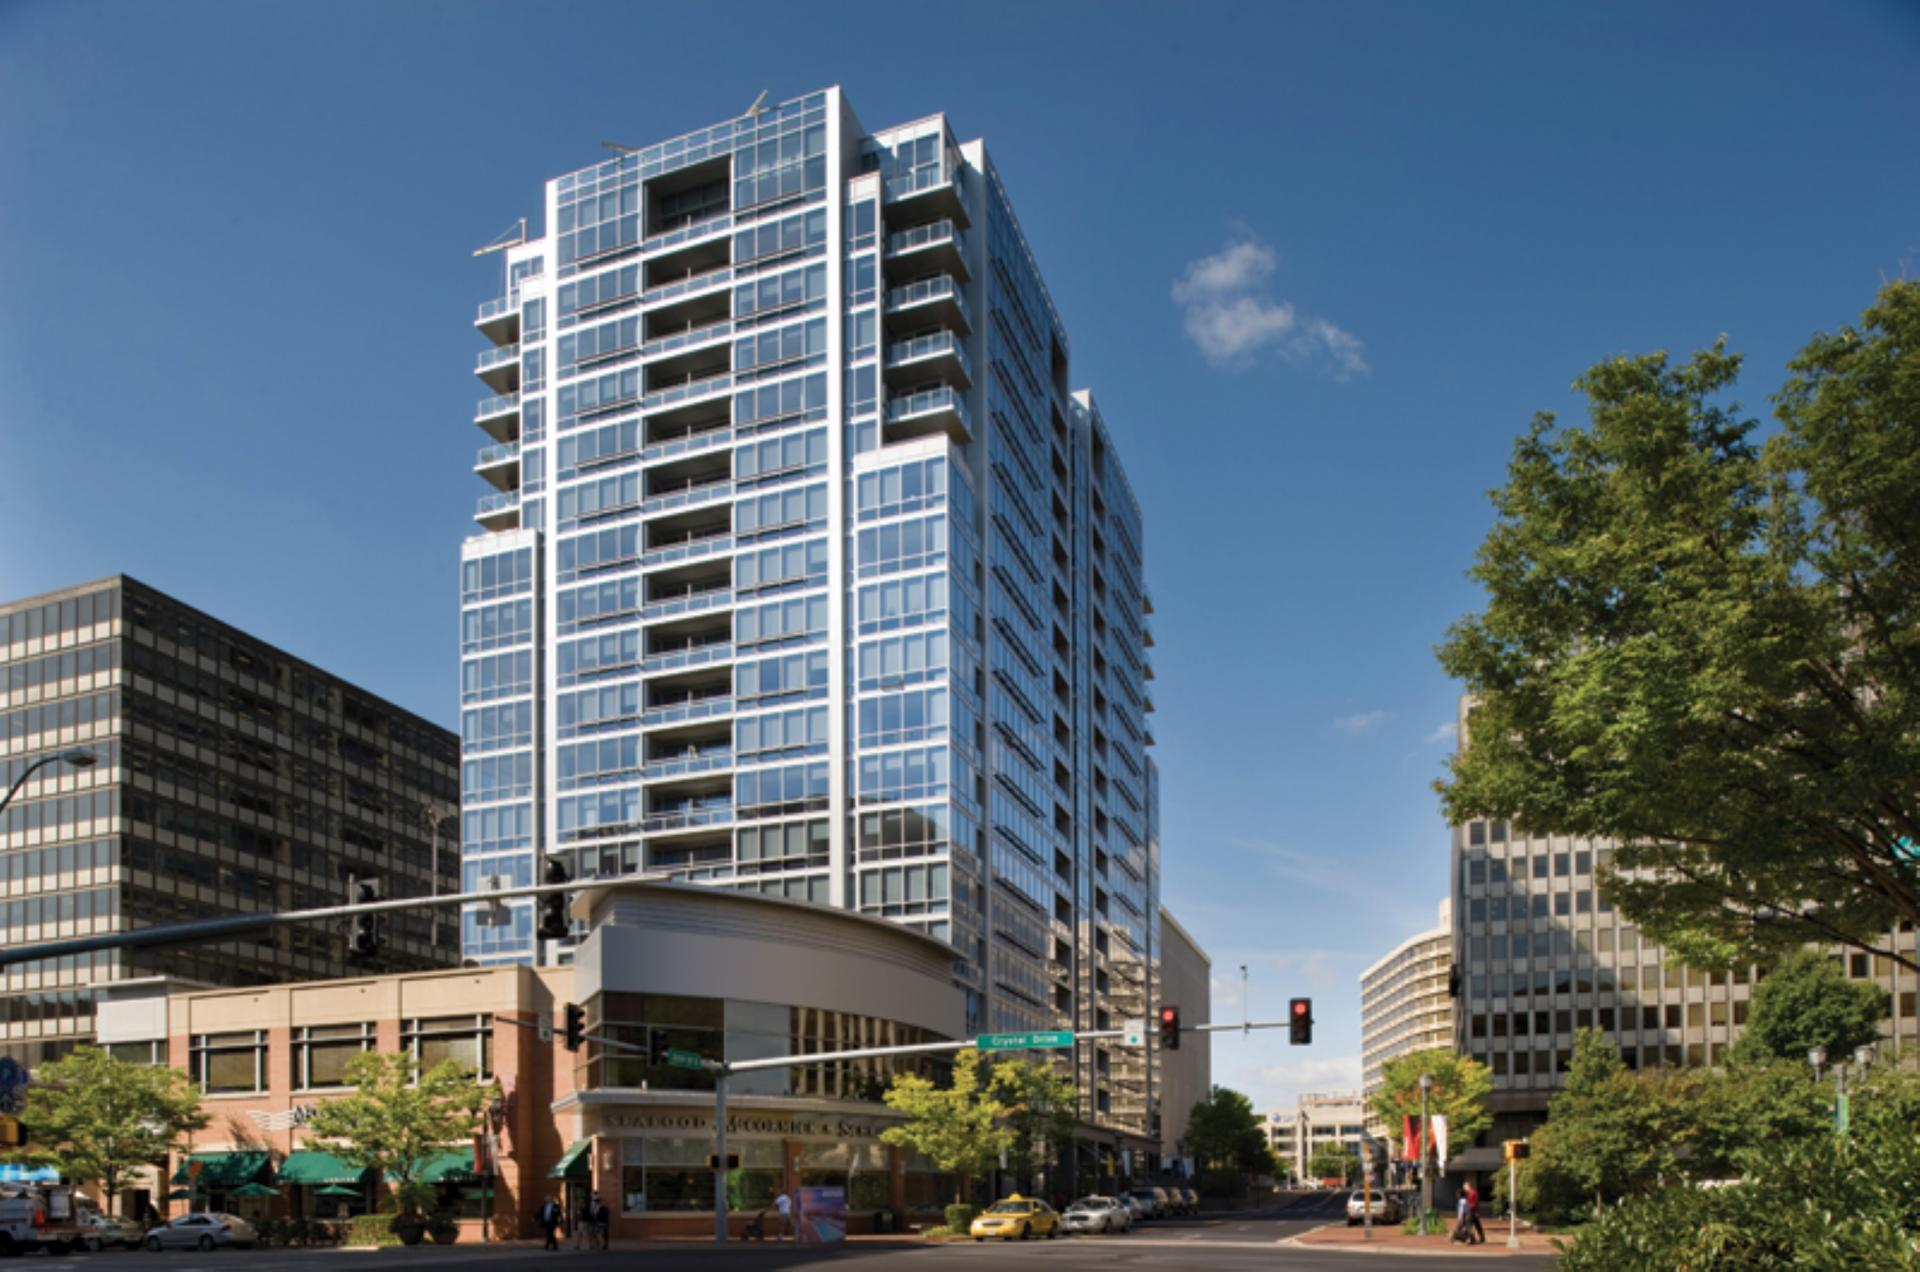 Exterior of 220 Twentieth Street Apartments, Crystal City, Arlington